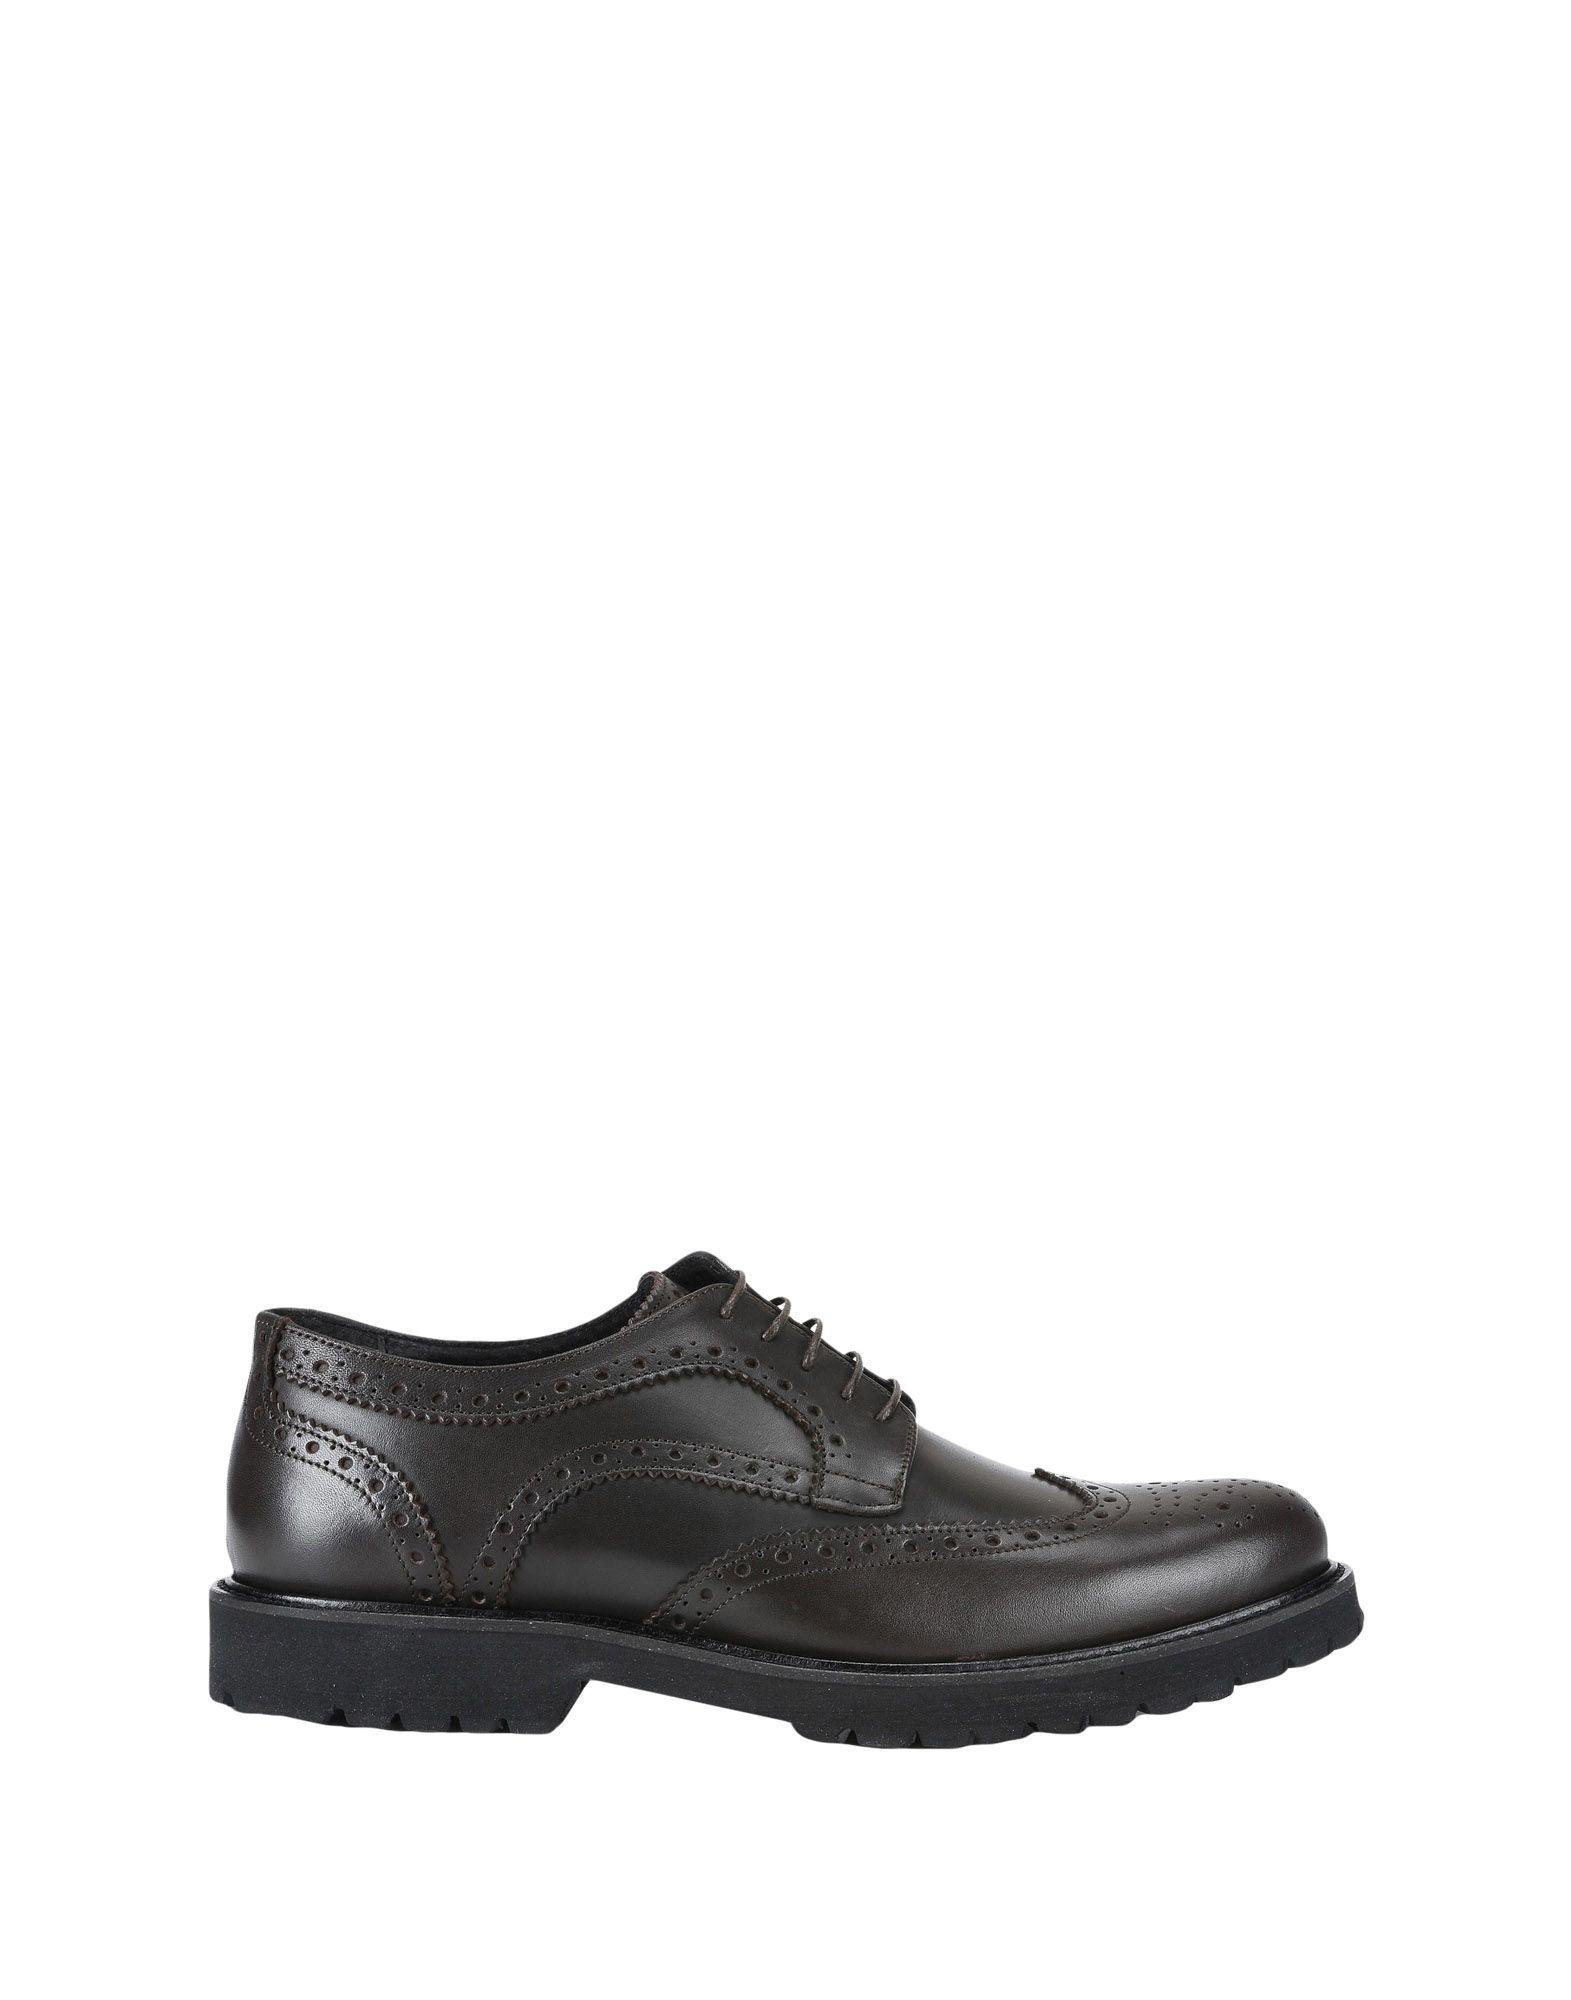 Фото - YLATI HERITAGE Обувь на шнурках обувь на высокой платформе dkny